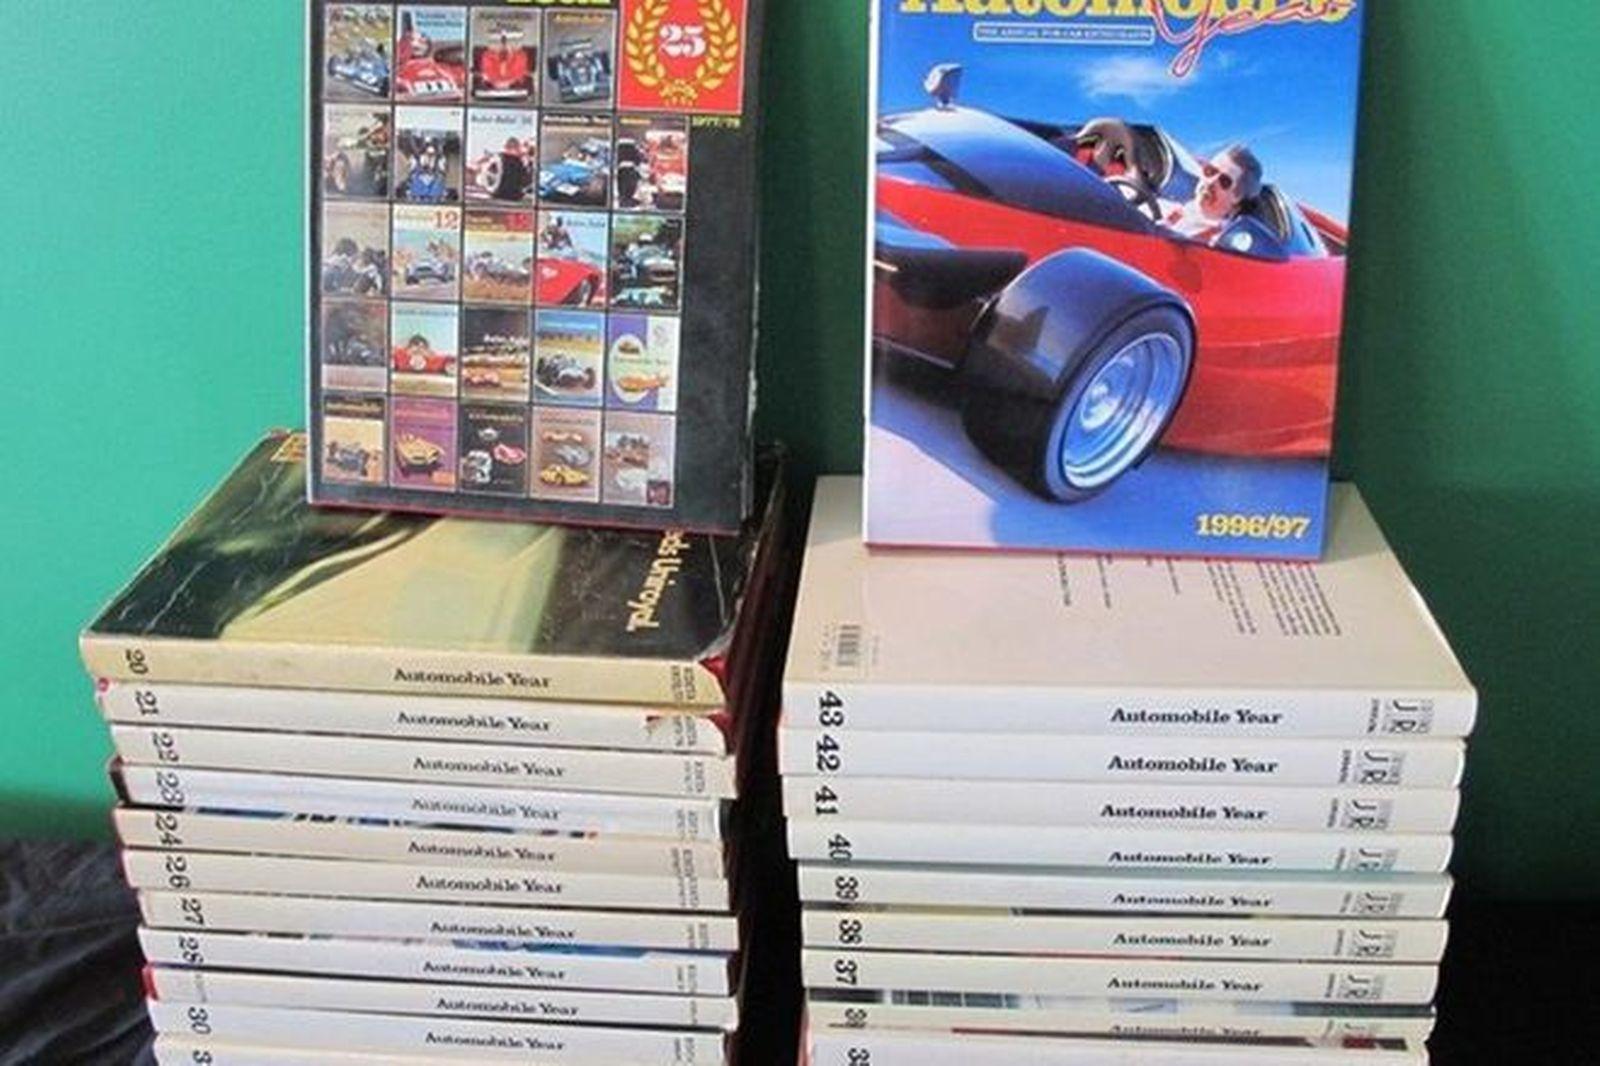 Books - 1 x Automobile Review, 26 x Automobile Year, 1 x Australian Motor Sport Review